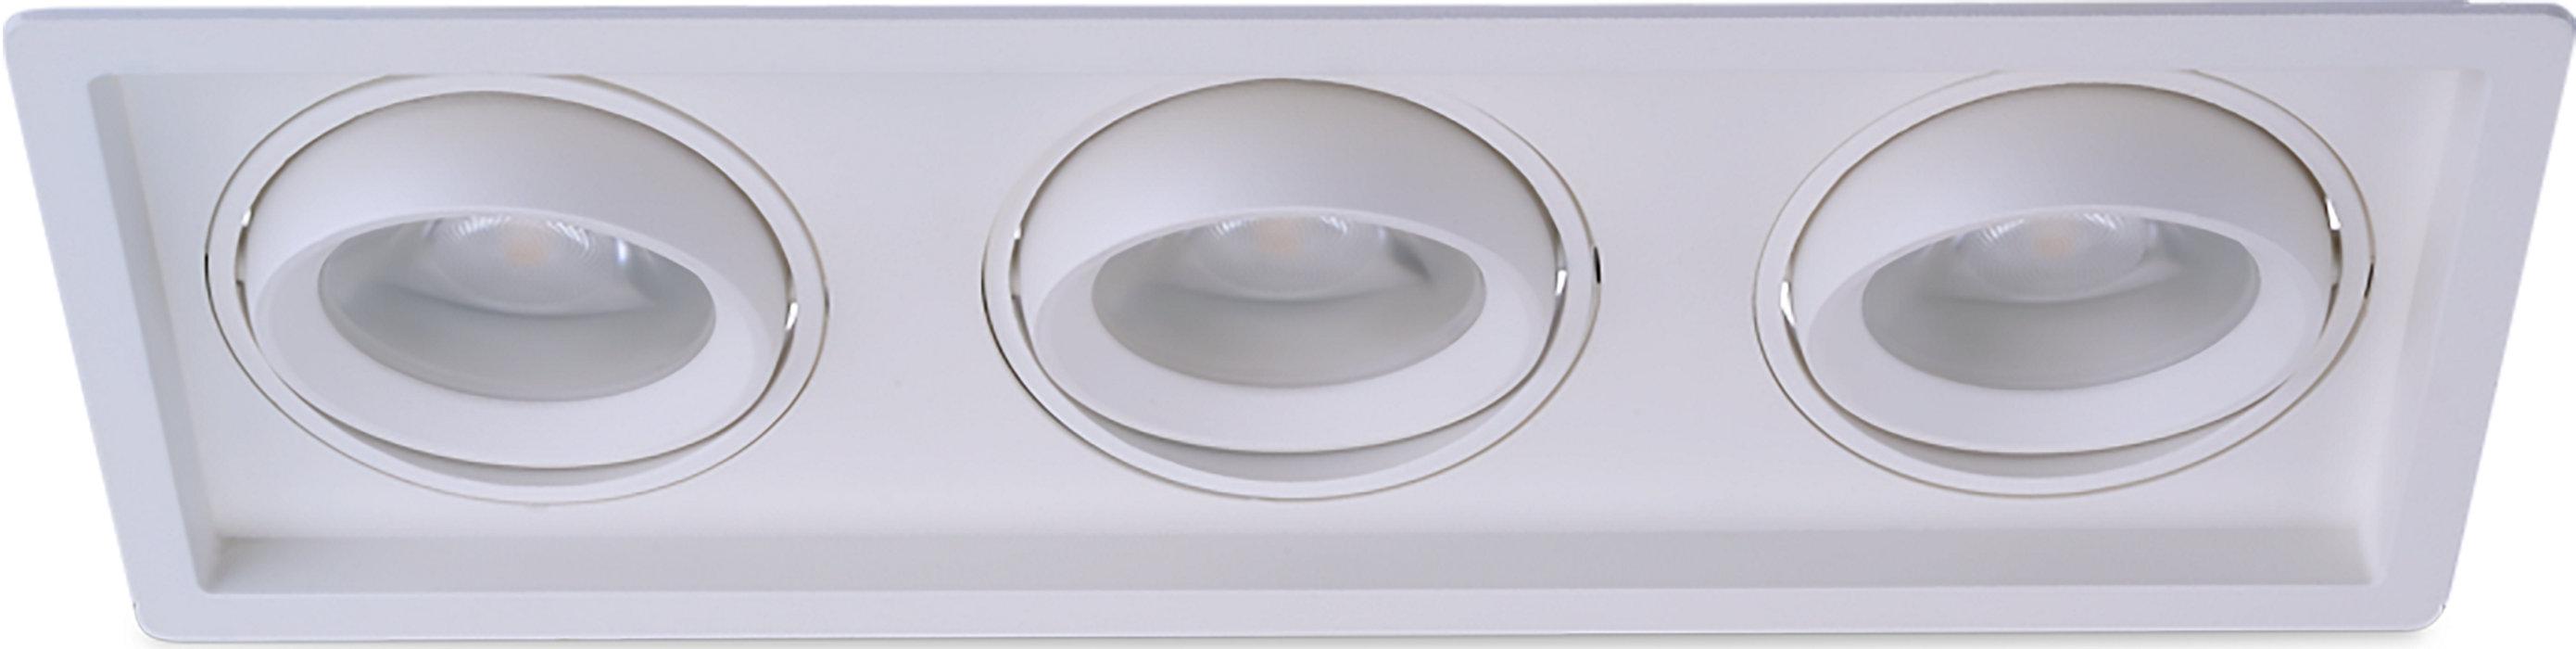 FlexAccent G2 - Excellent light quality